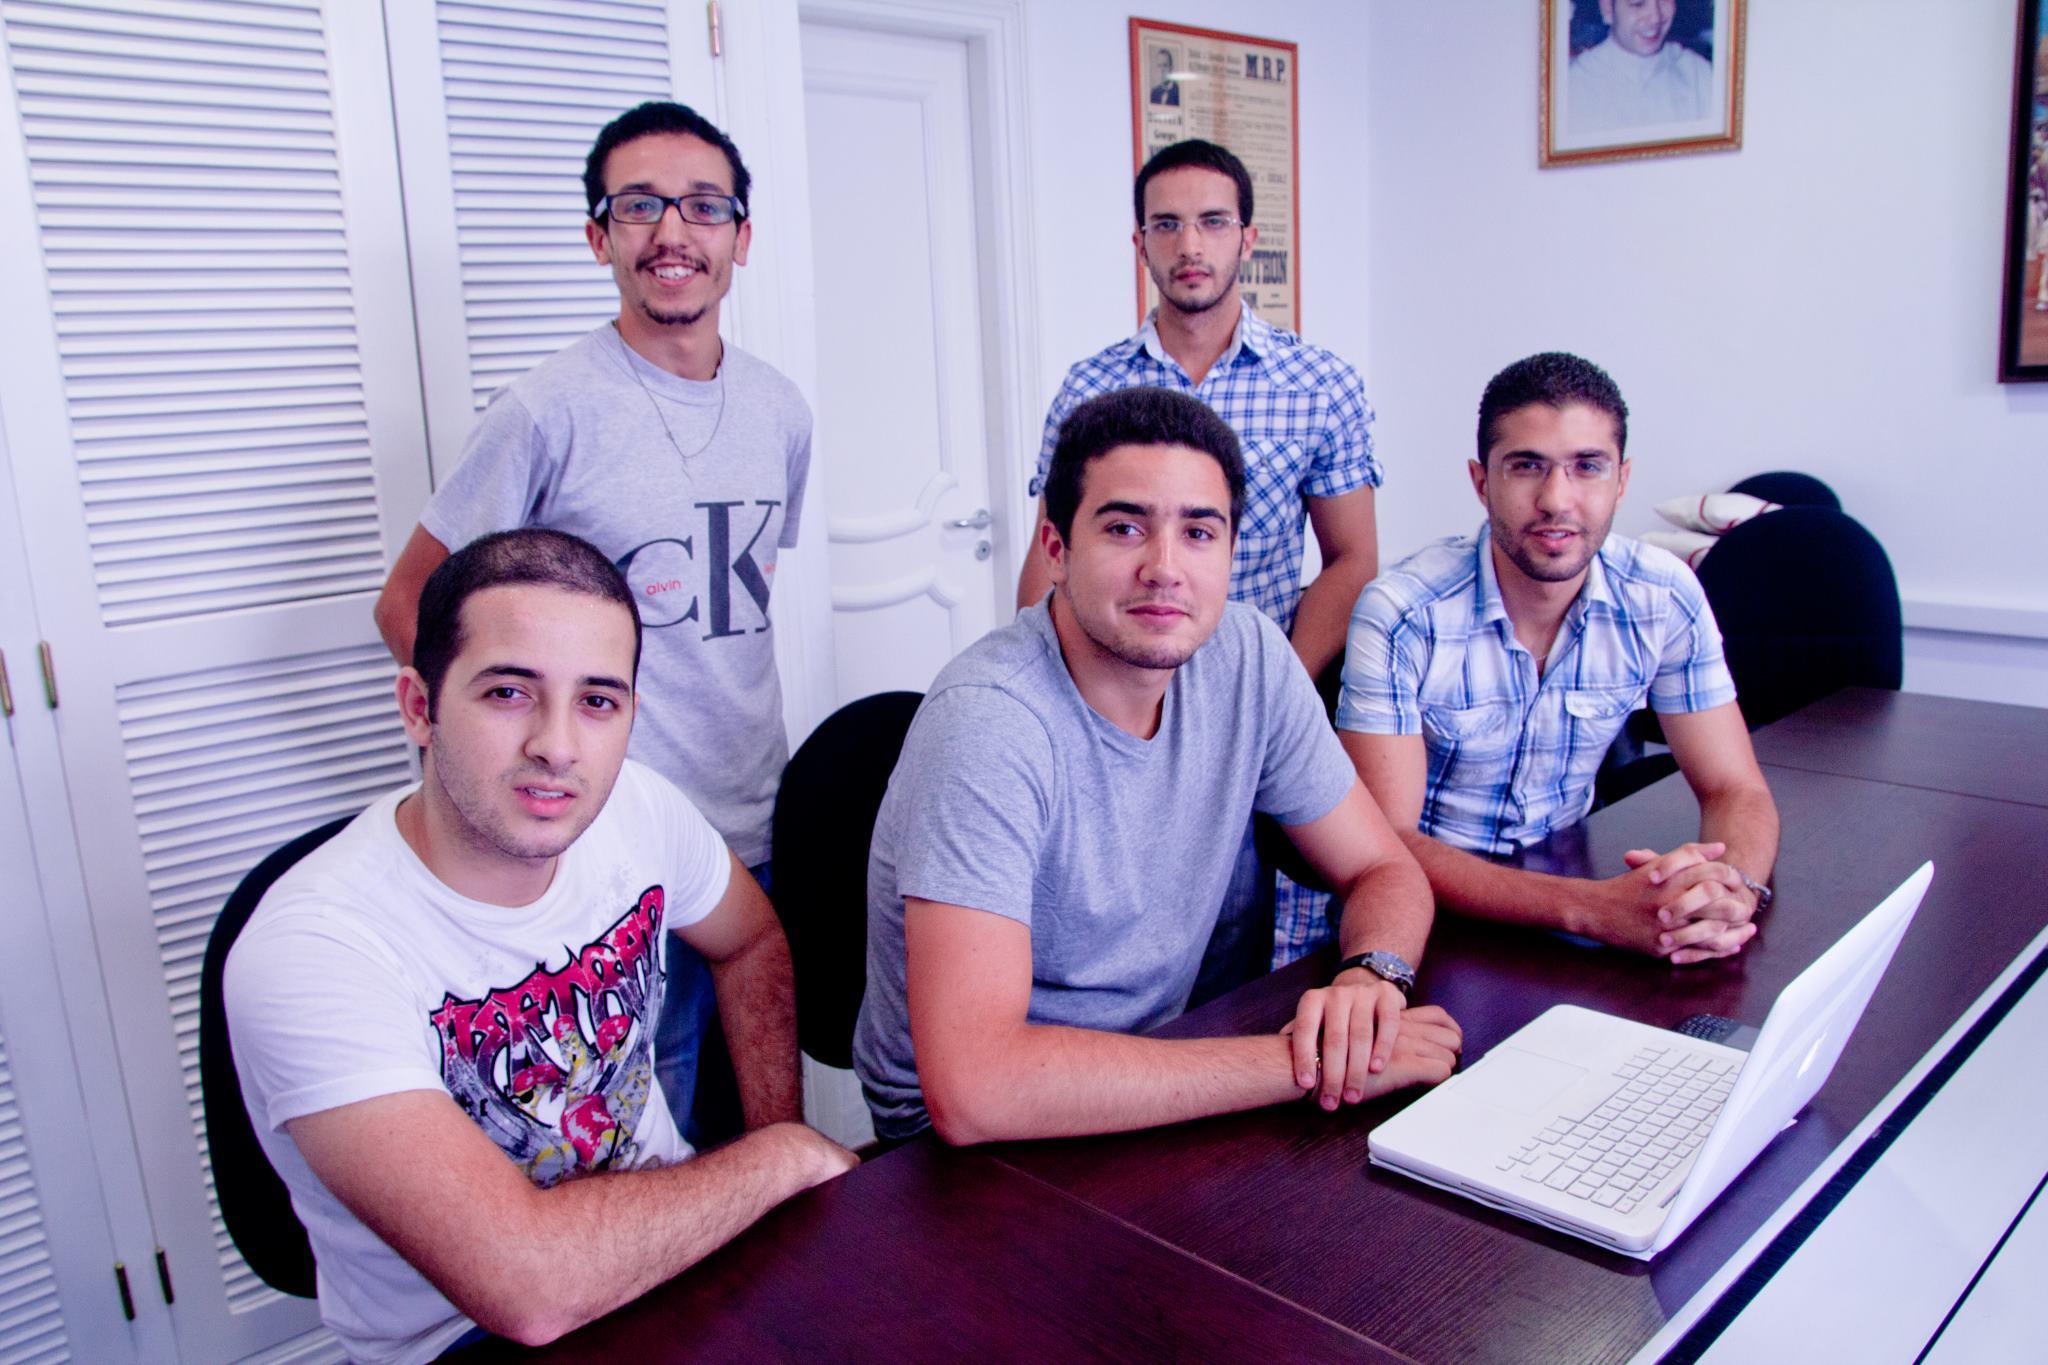 equipe-alamjadid-reseau-social-ceo-mohamed-el-yacoubi